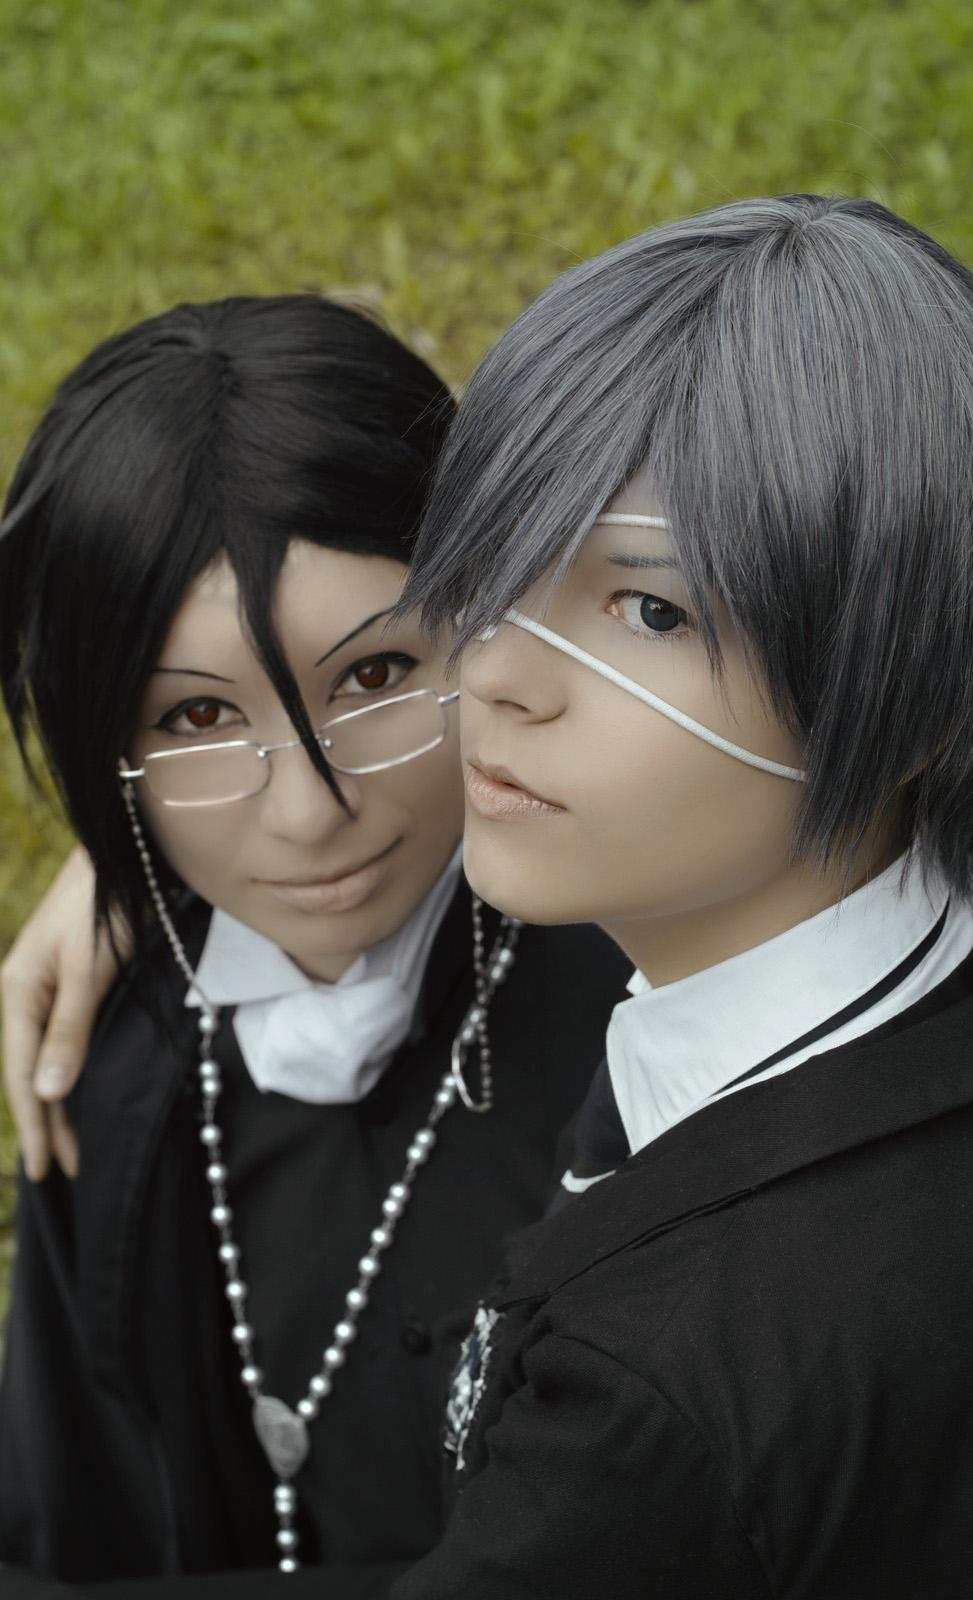 Auricular Confession by Kurimuzondorii